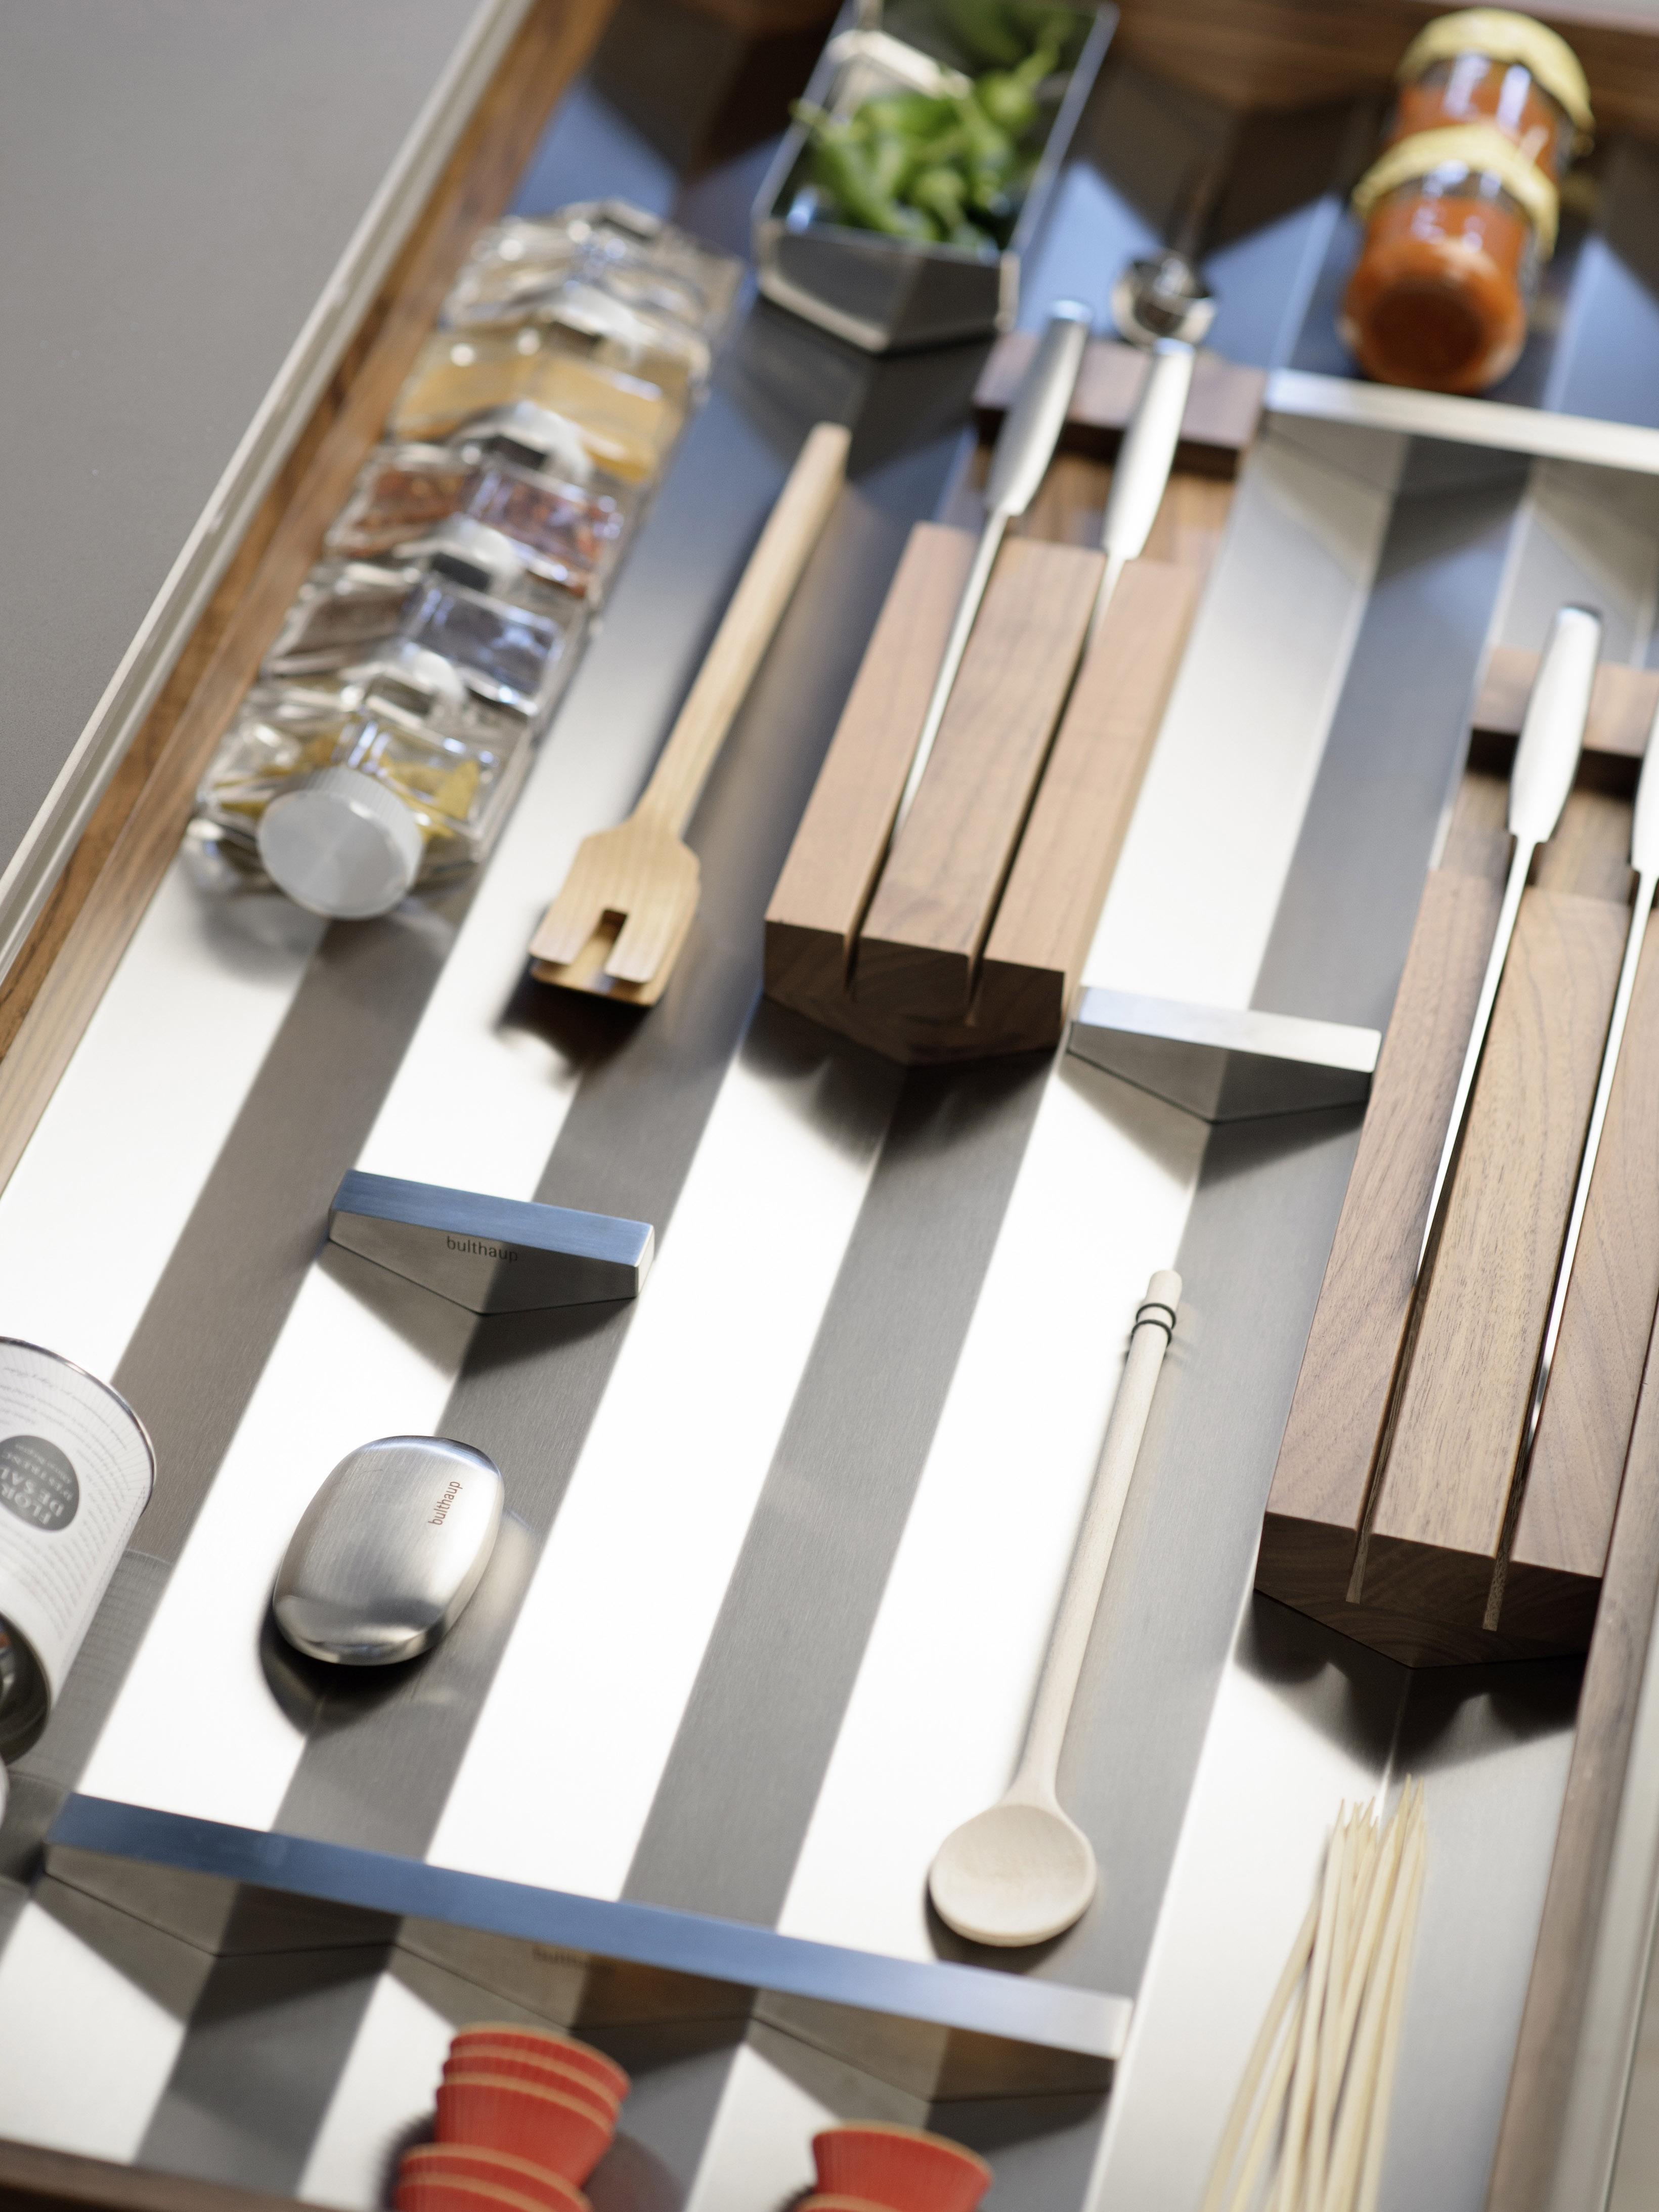 bulthaup b3 interior fitting system wins 2013 design award. Black Bedroom Furniture Sets. Home Design Ideas